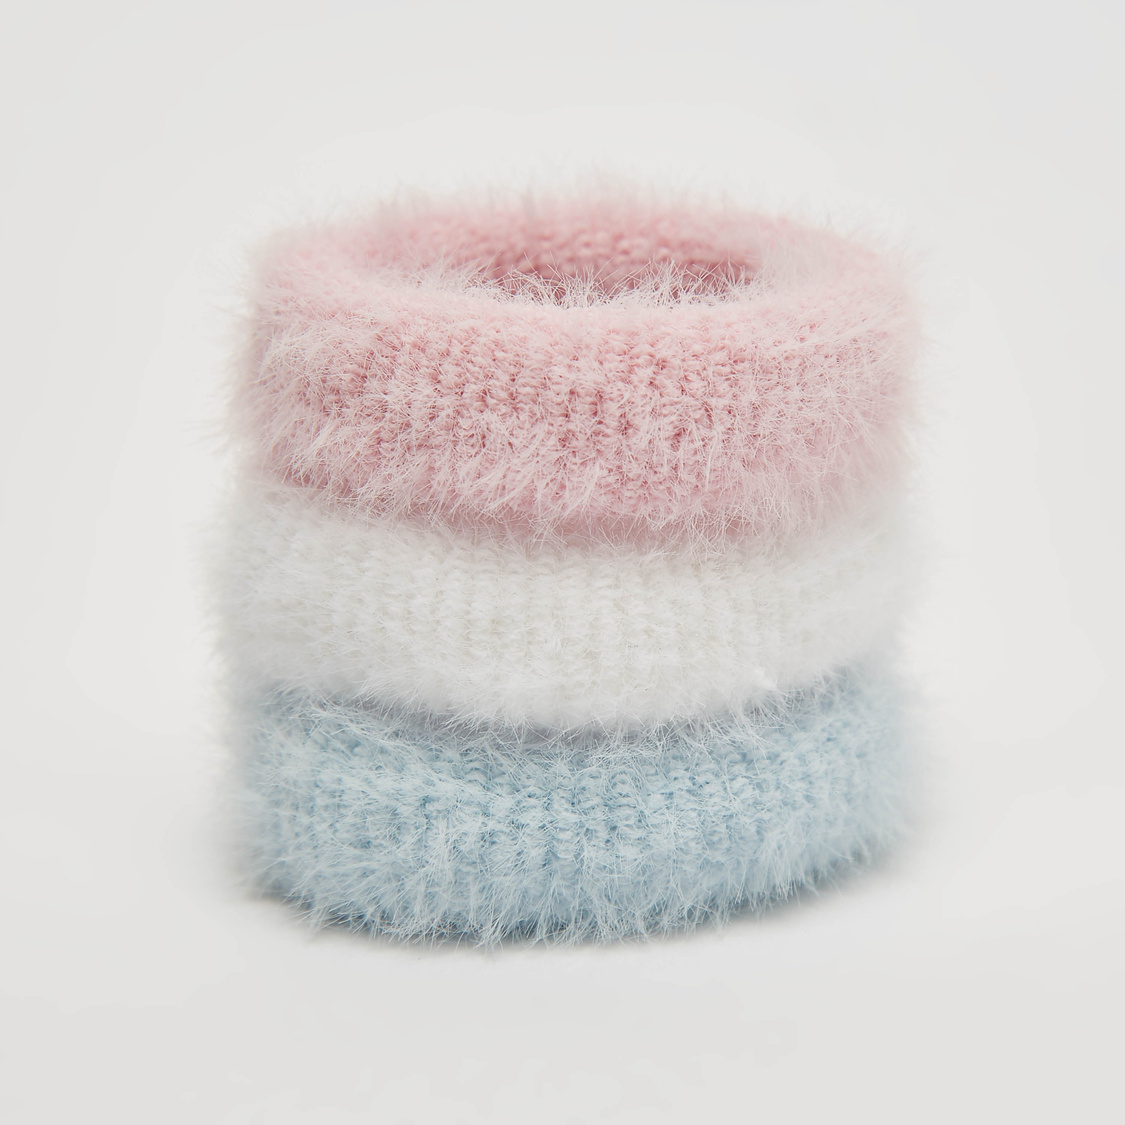 Set of 3 - Textured Hair Tie